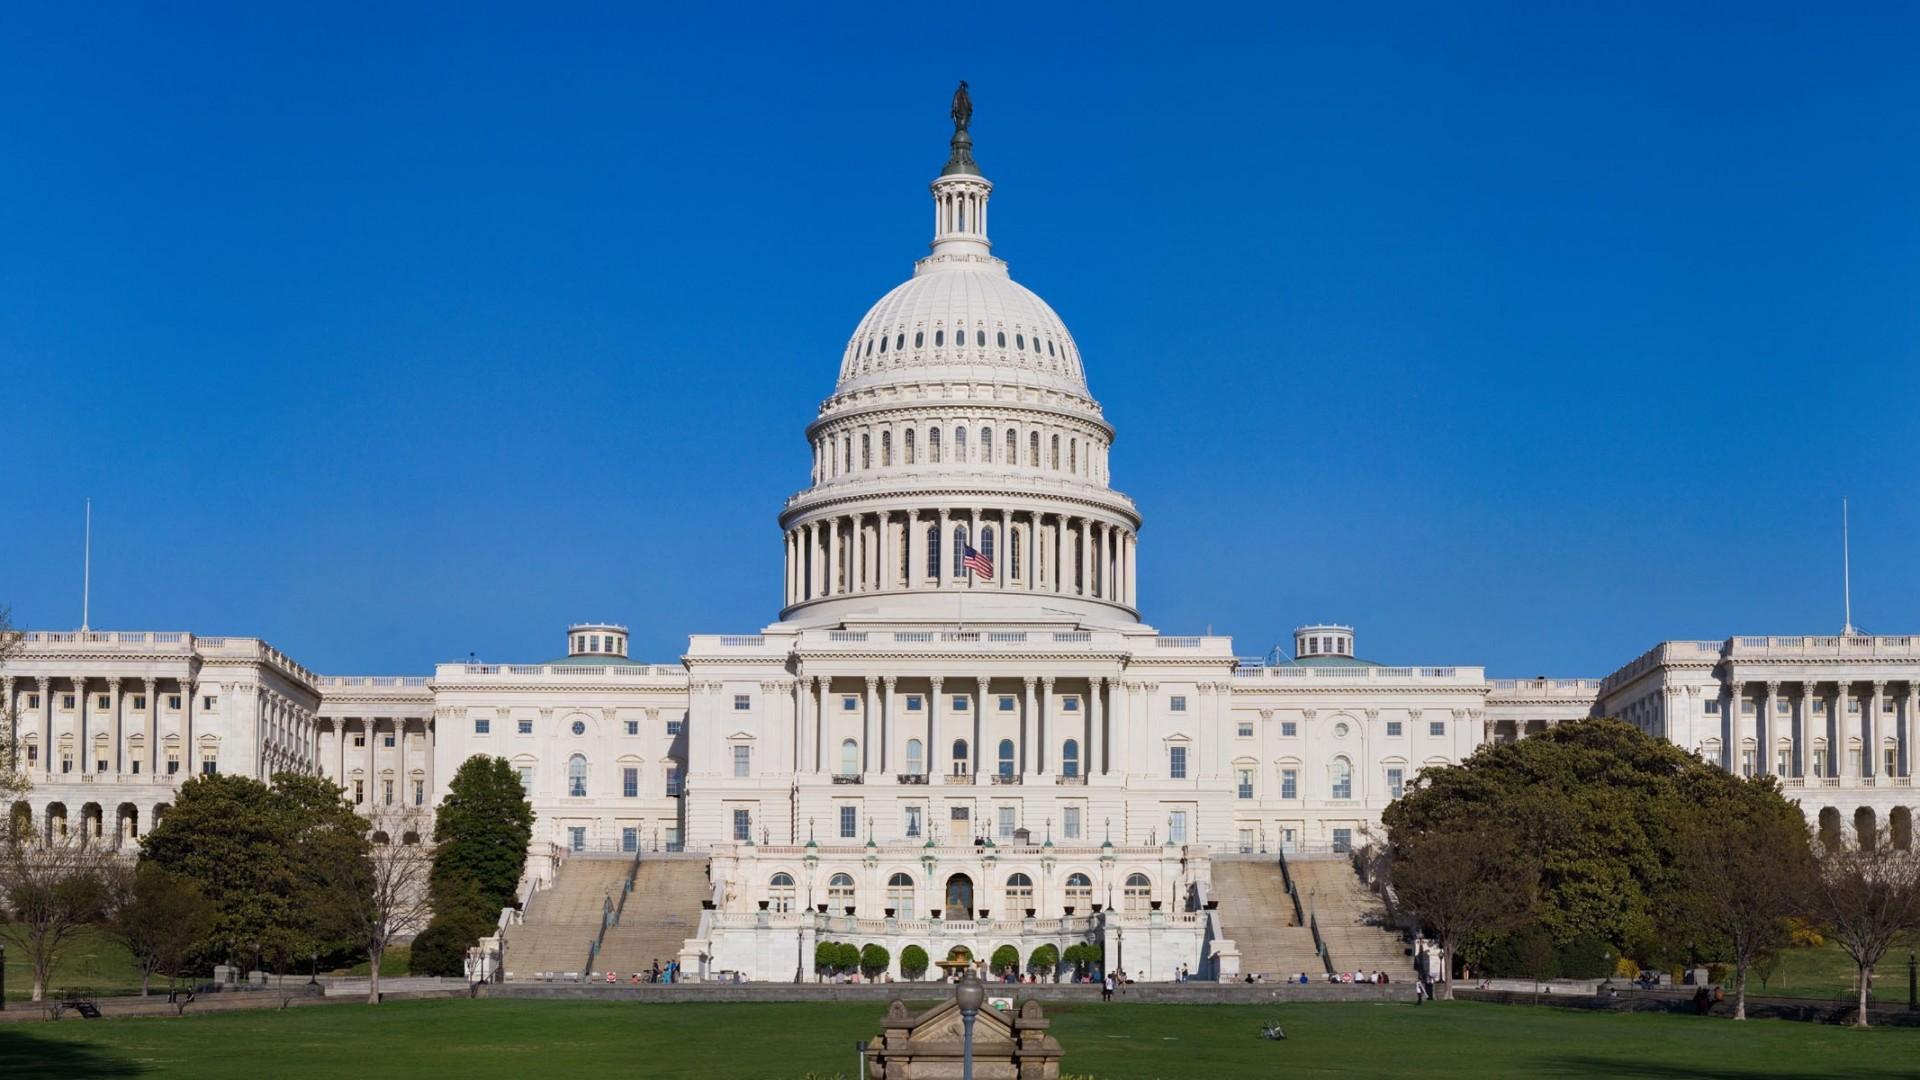 United States Capitol Wallpaper 2   1920 X 1080 stmednet 1920x1080